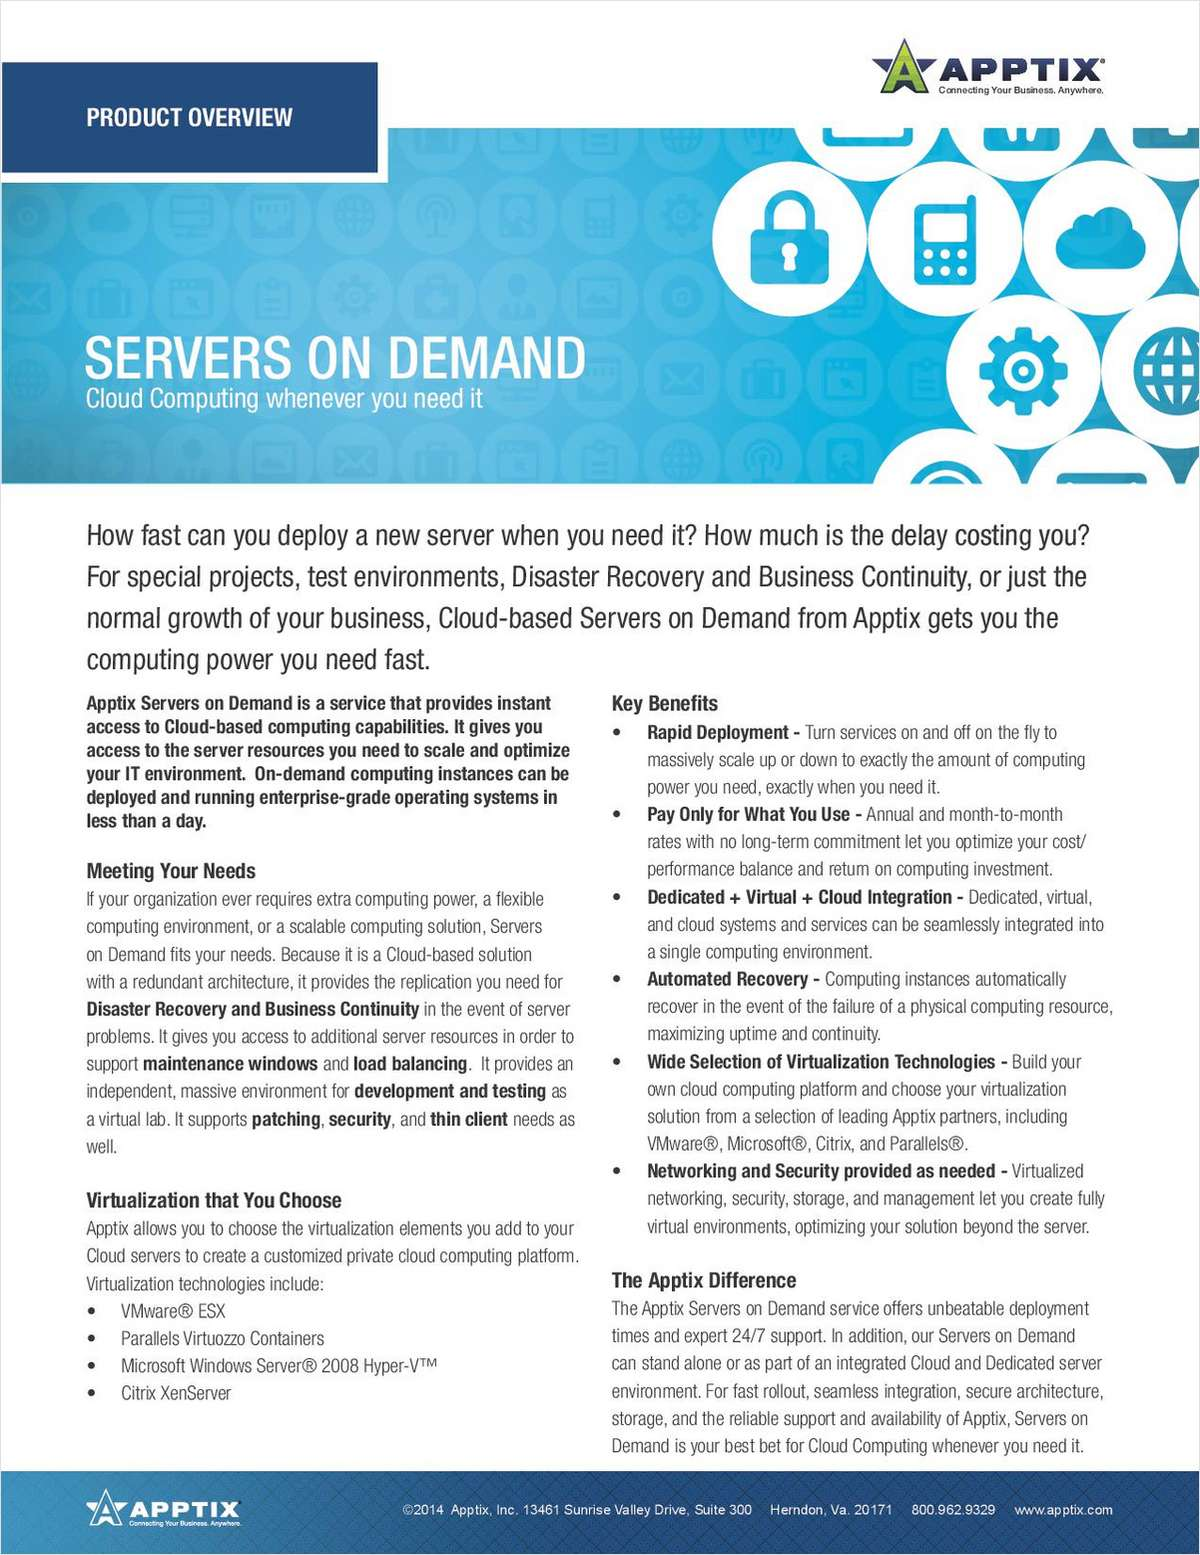 Servers on Demand